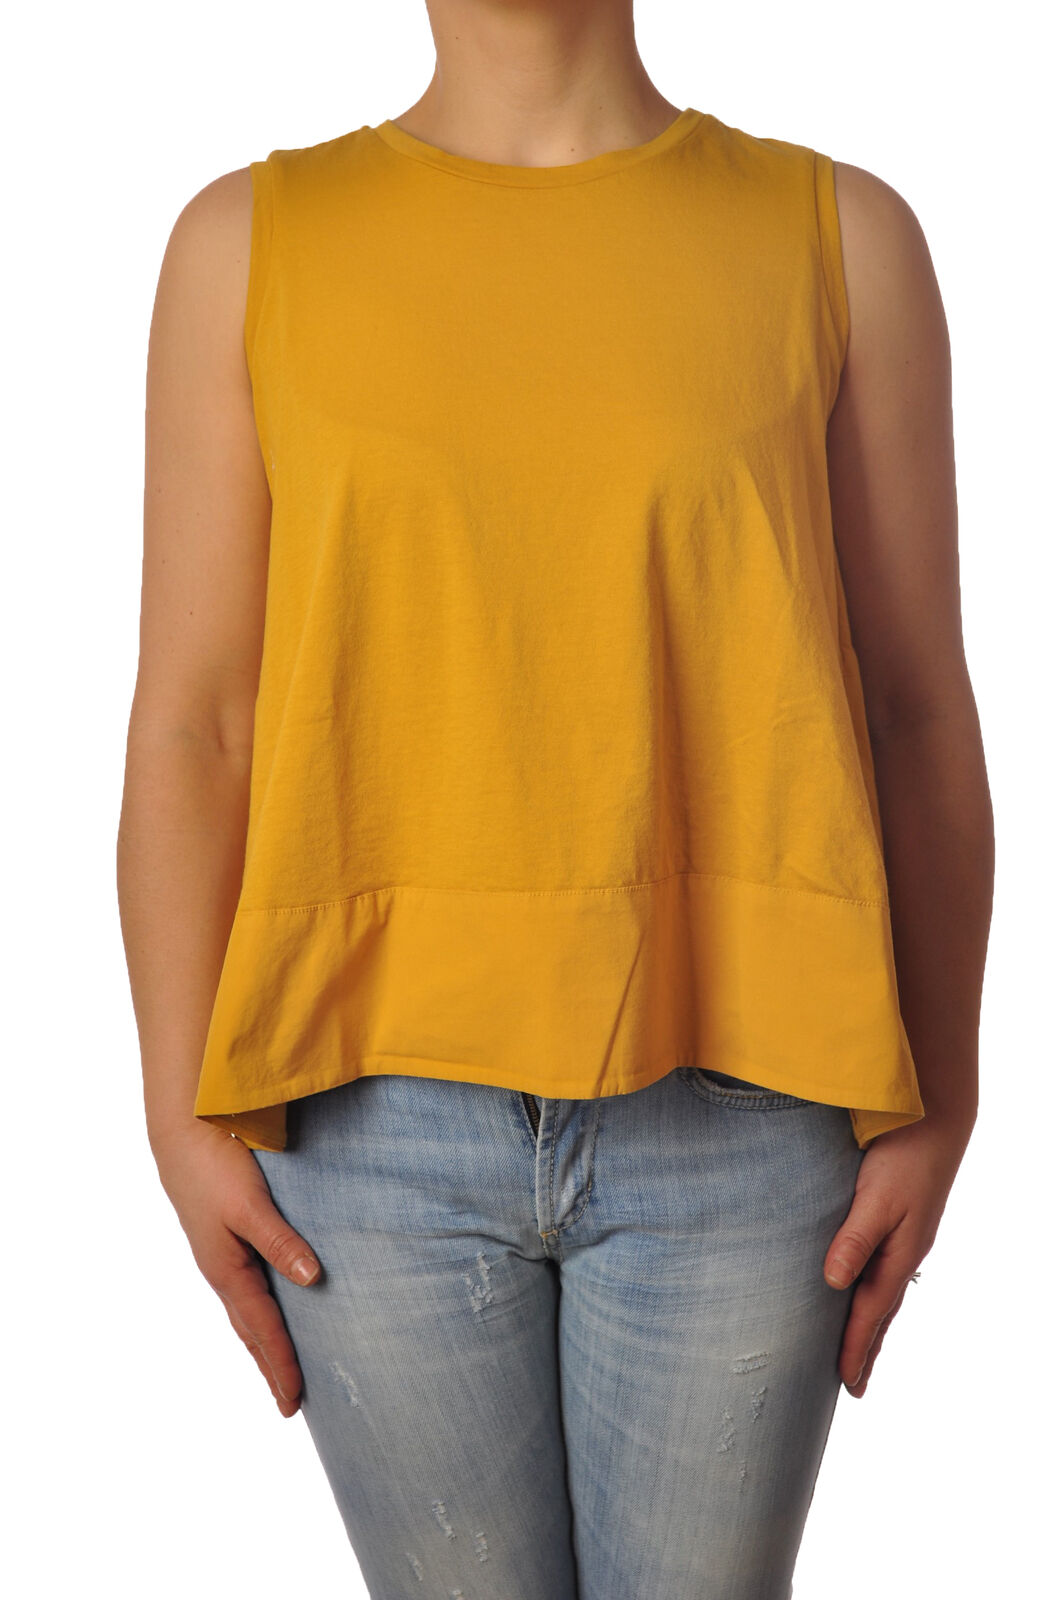 Ottod'ame - Topwear-Sleeveless Top - Woman - Gelb - 4942526E183955